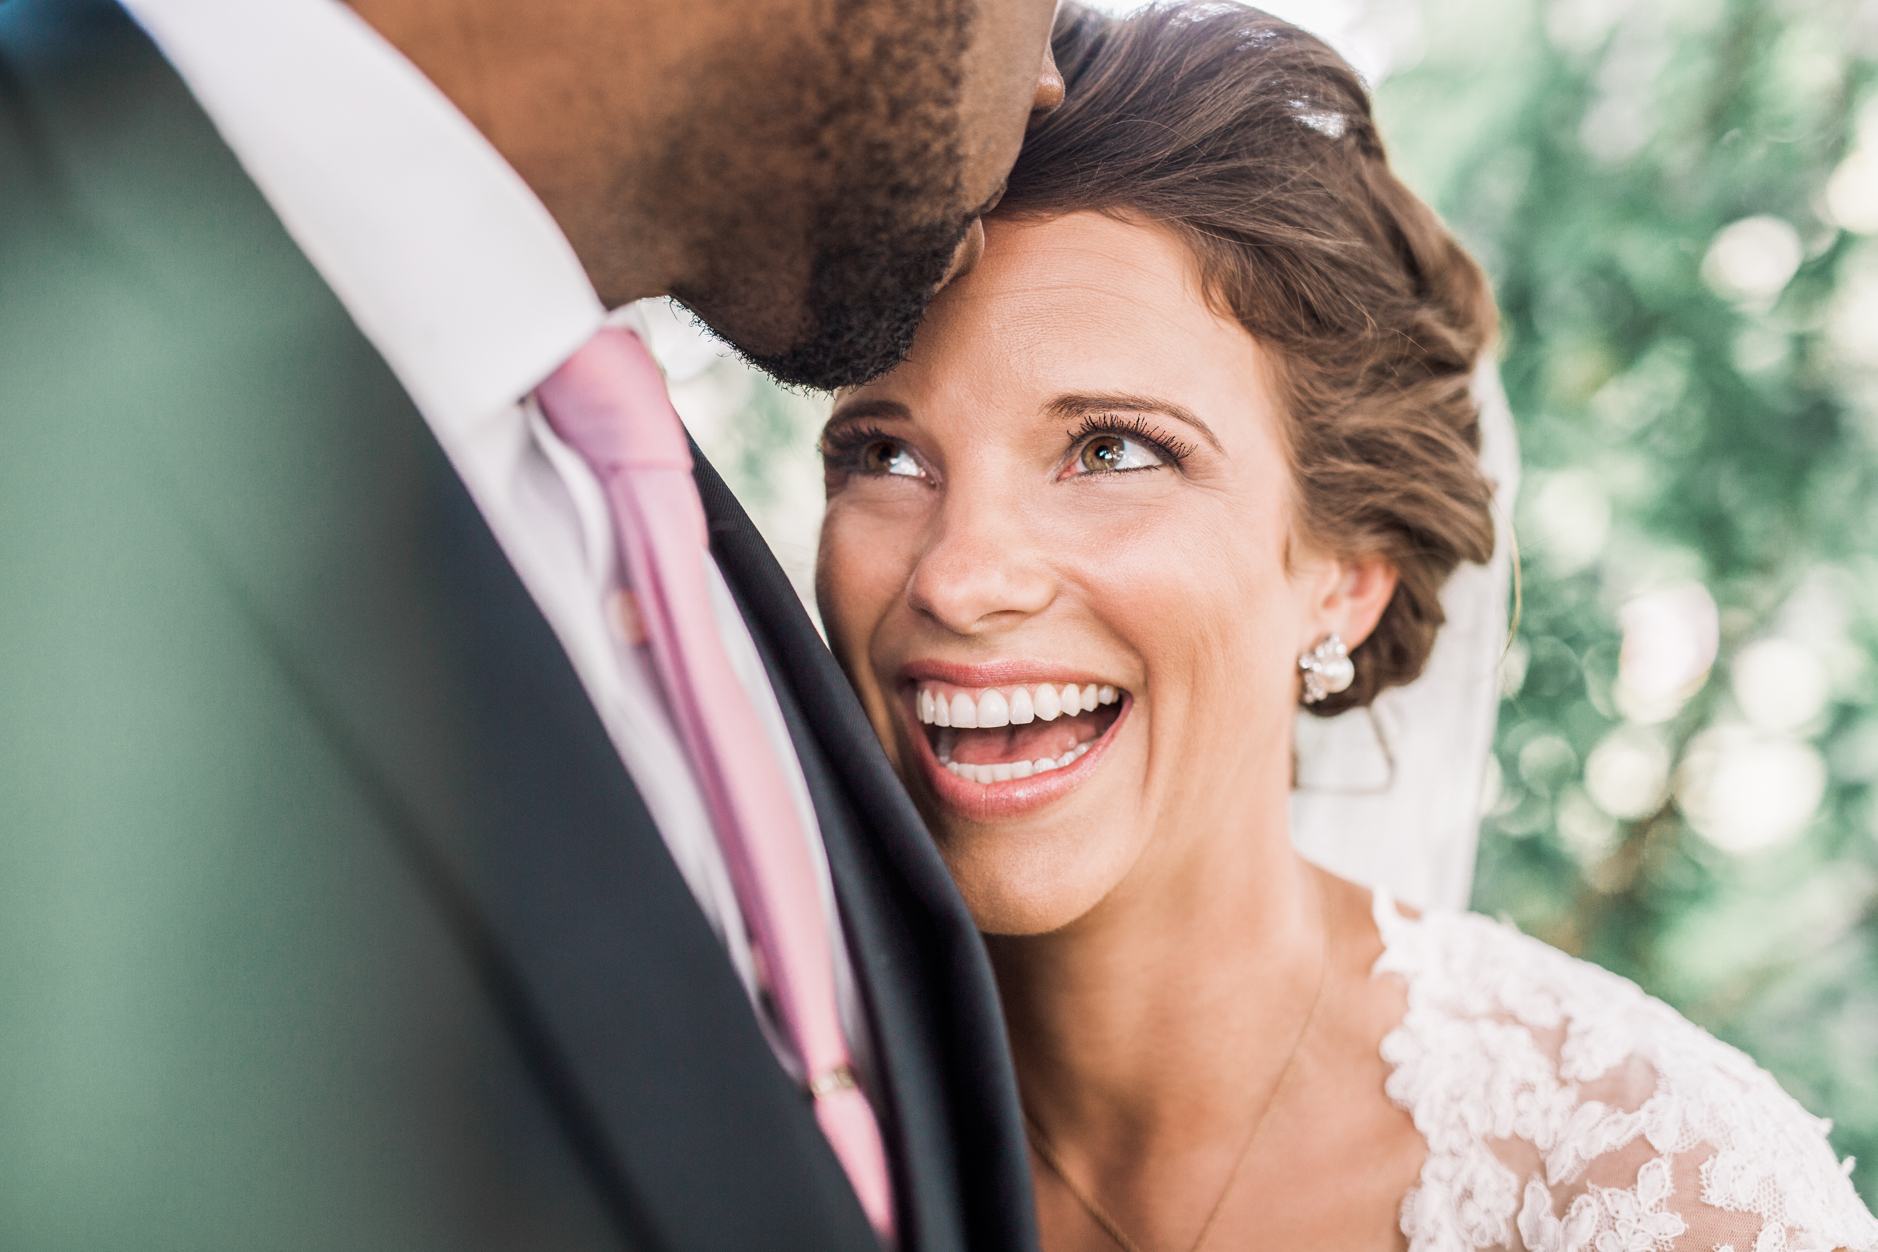 LegacyUnion-Wedding-Photographer-Glendale-CA-101-2.jpg